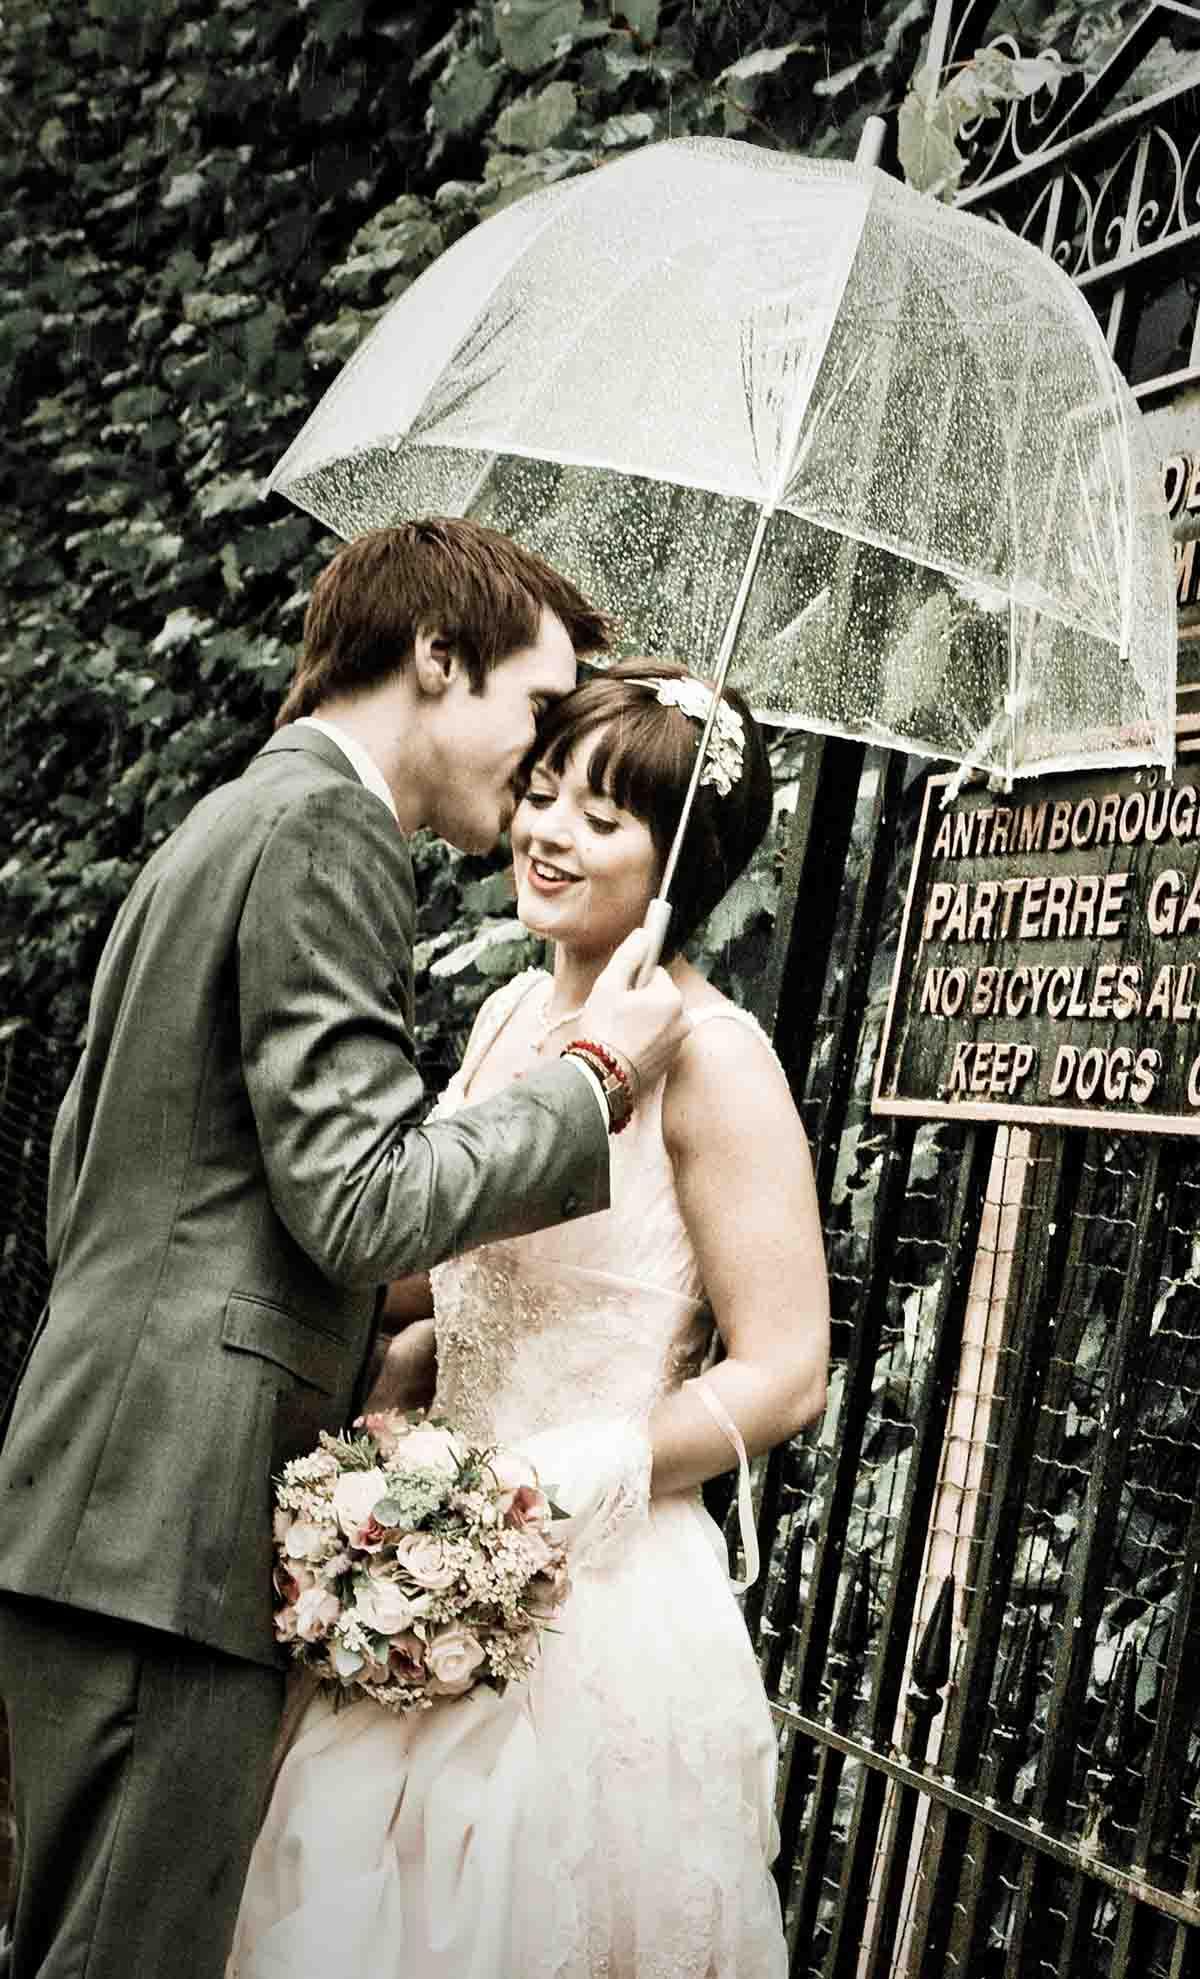 Wedding couple kiss in the rain under an umbrella